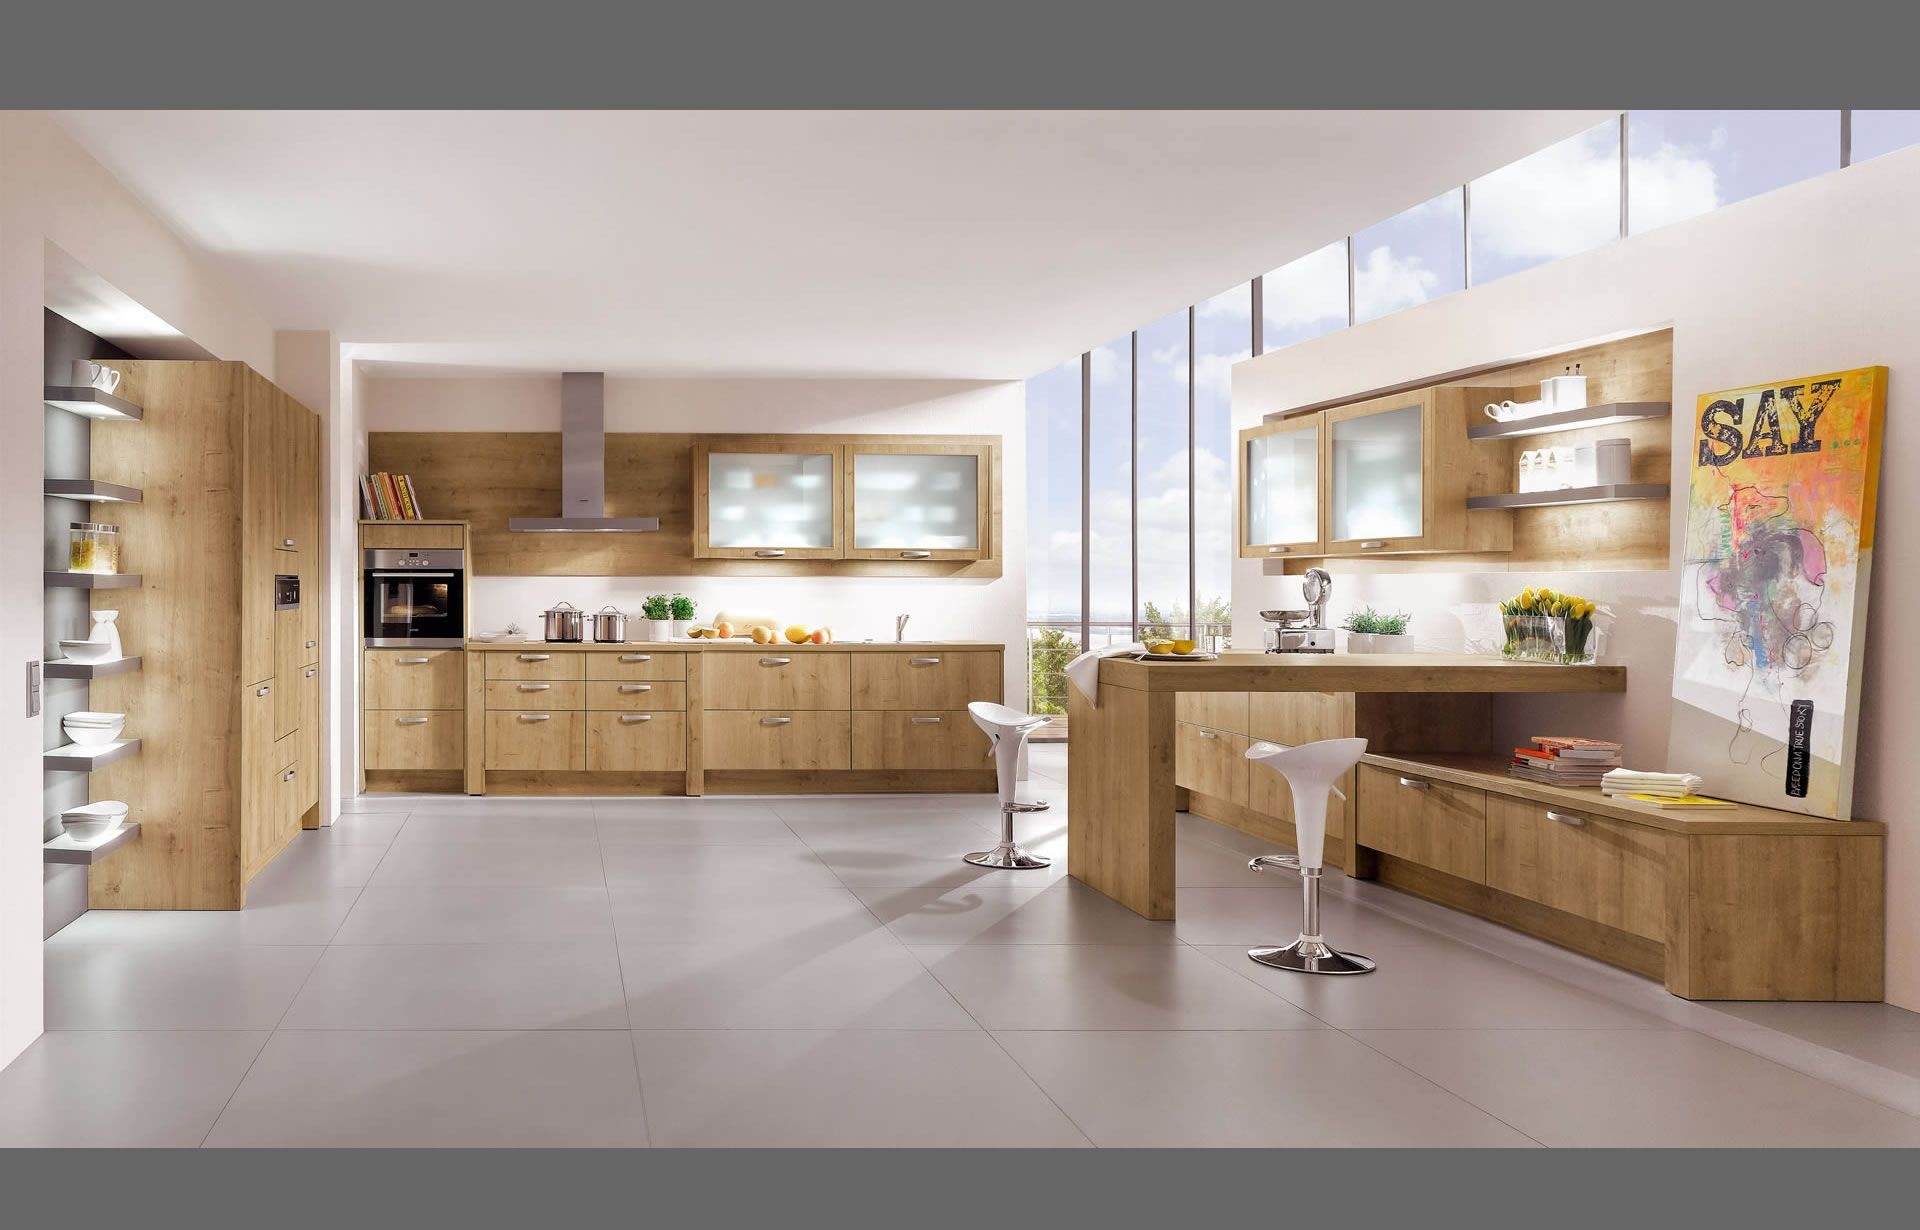 Bulthaup Küchenrollenhalter ~ 27 best nobilia konyhabútor images on pinterest dreams kitchen